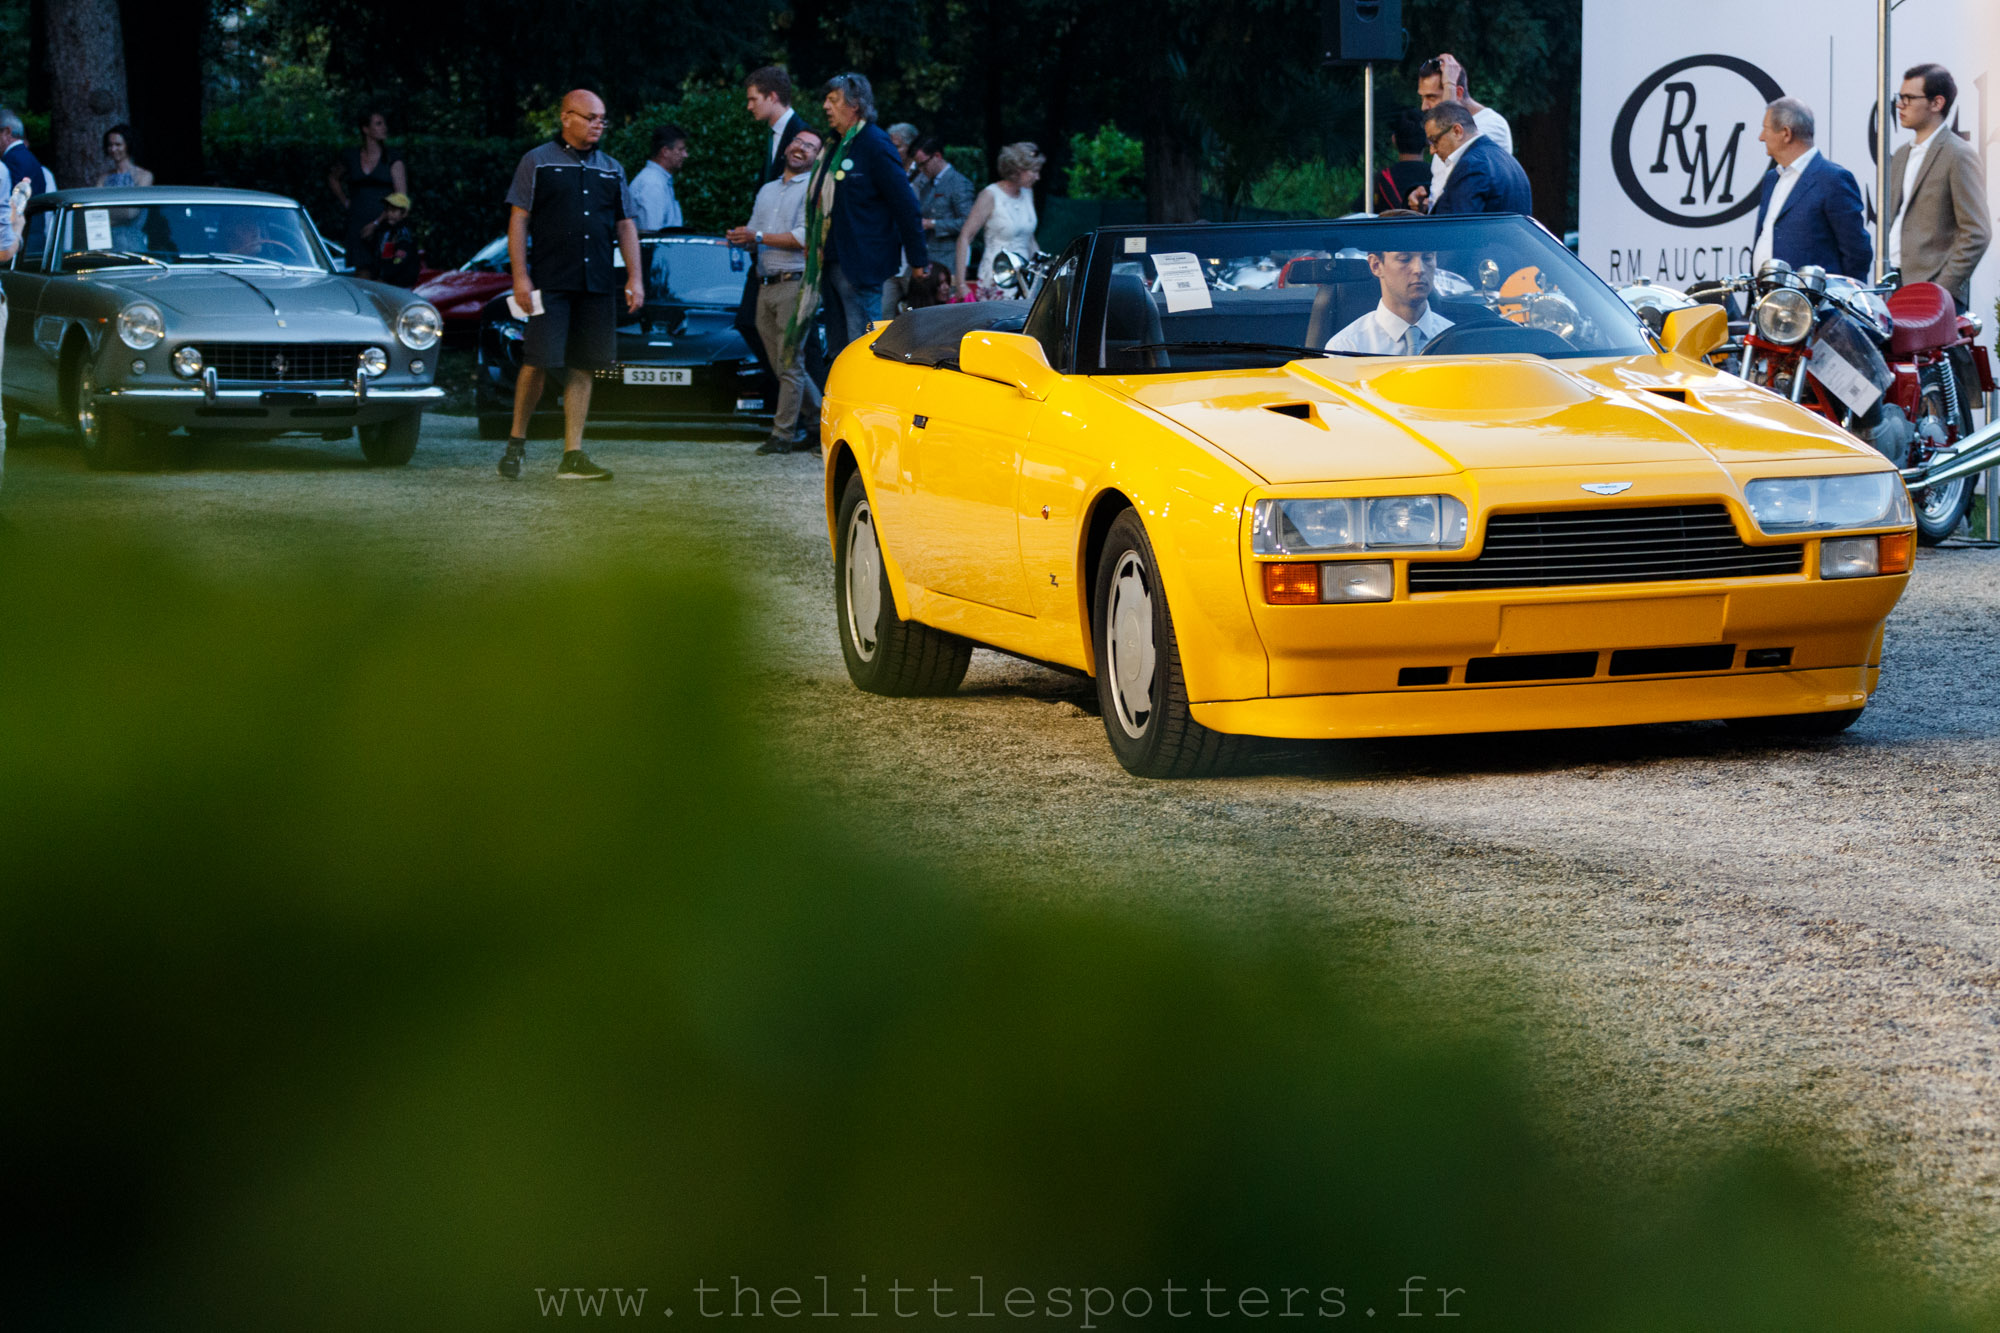 Aston Martin V8 Vantage Volante Zagato, adjugée 459 200 euros.